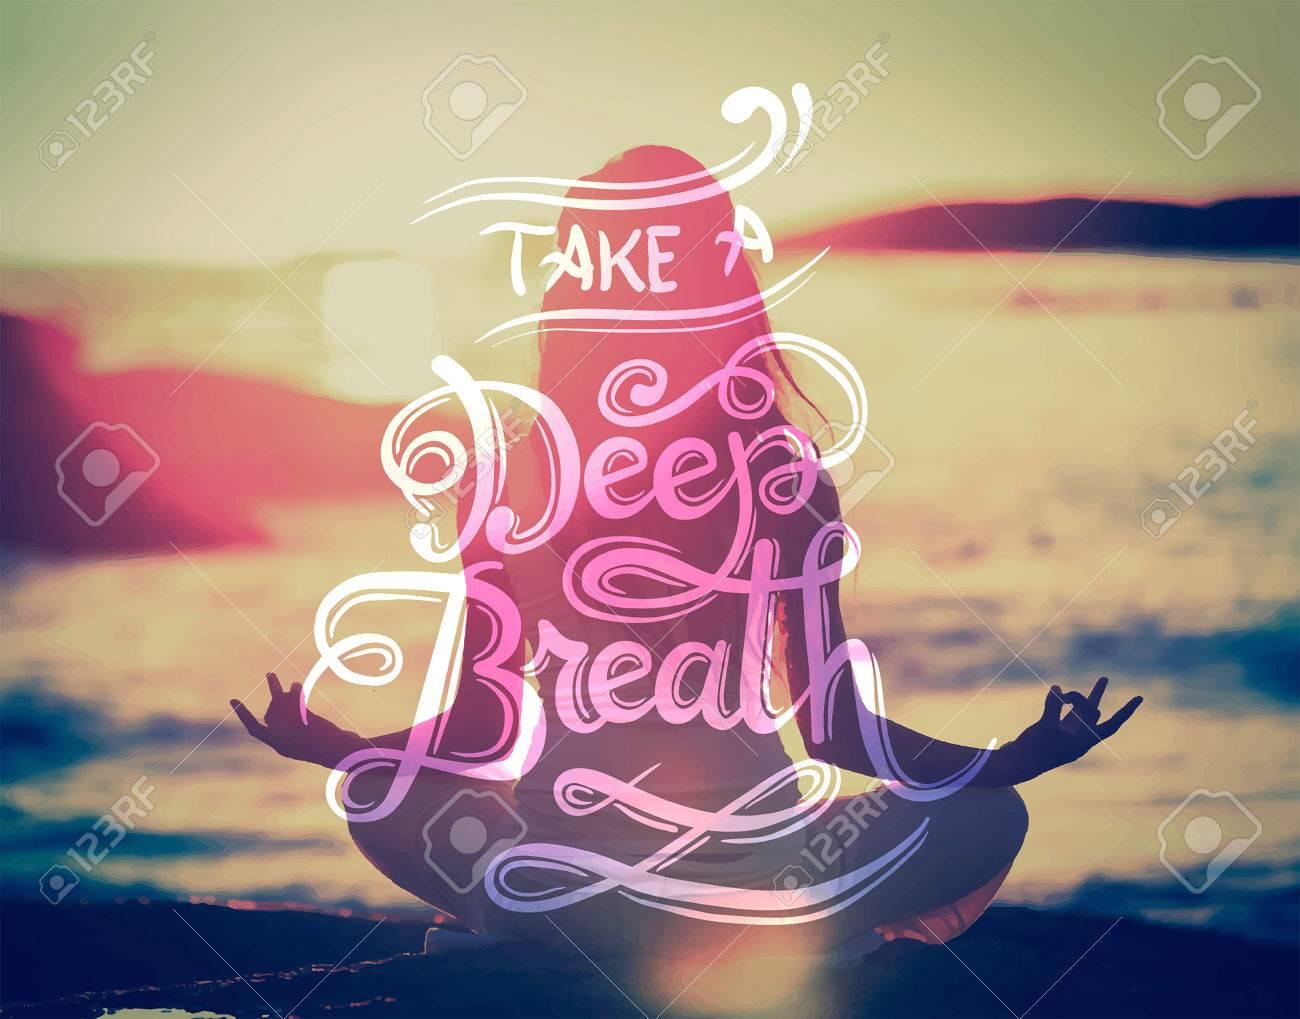 Digitally generated Take a deep breath vector - 38095866